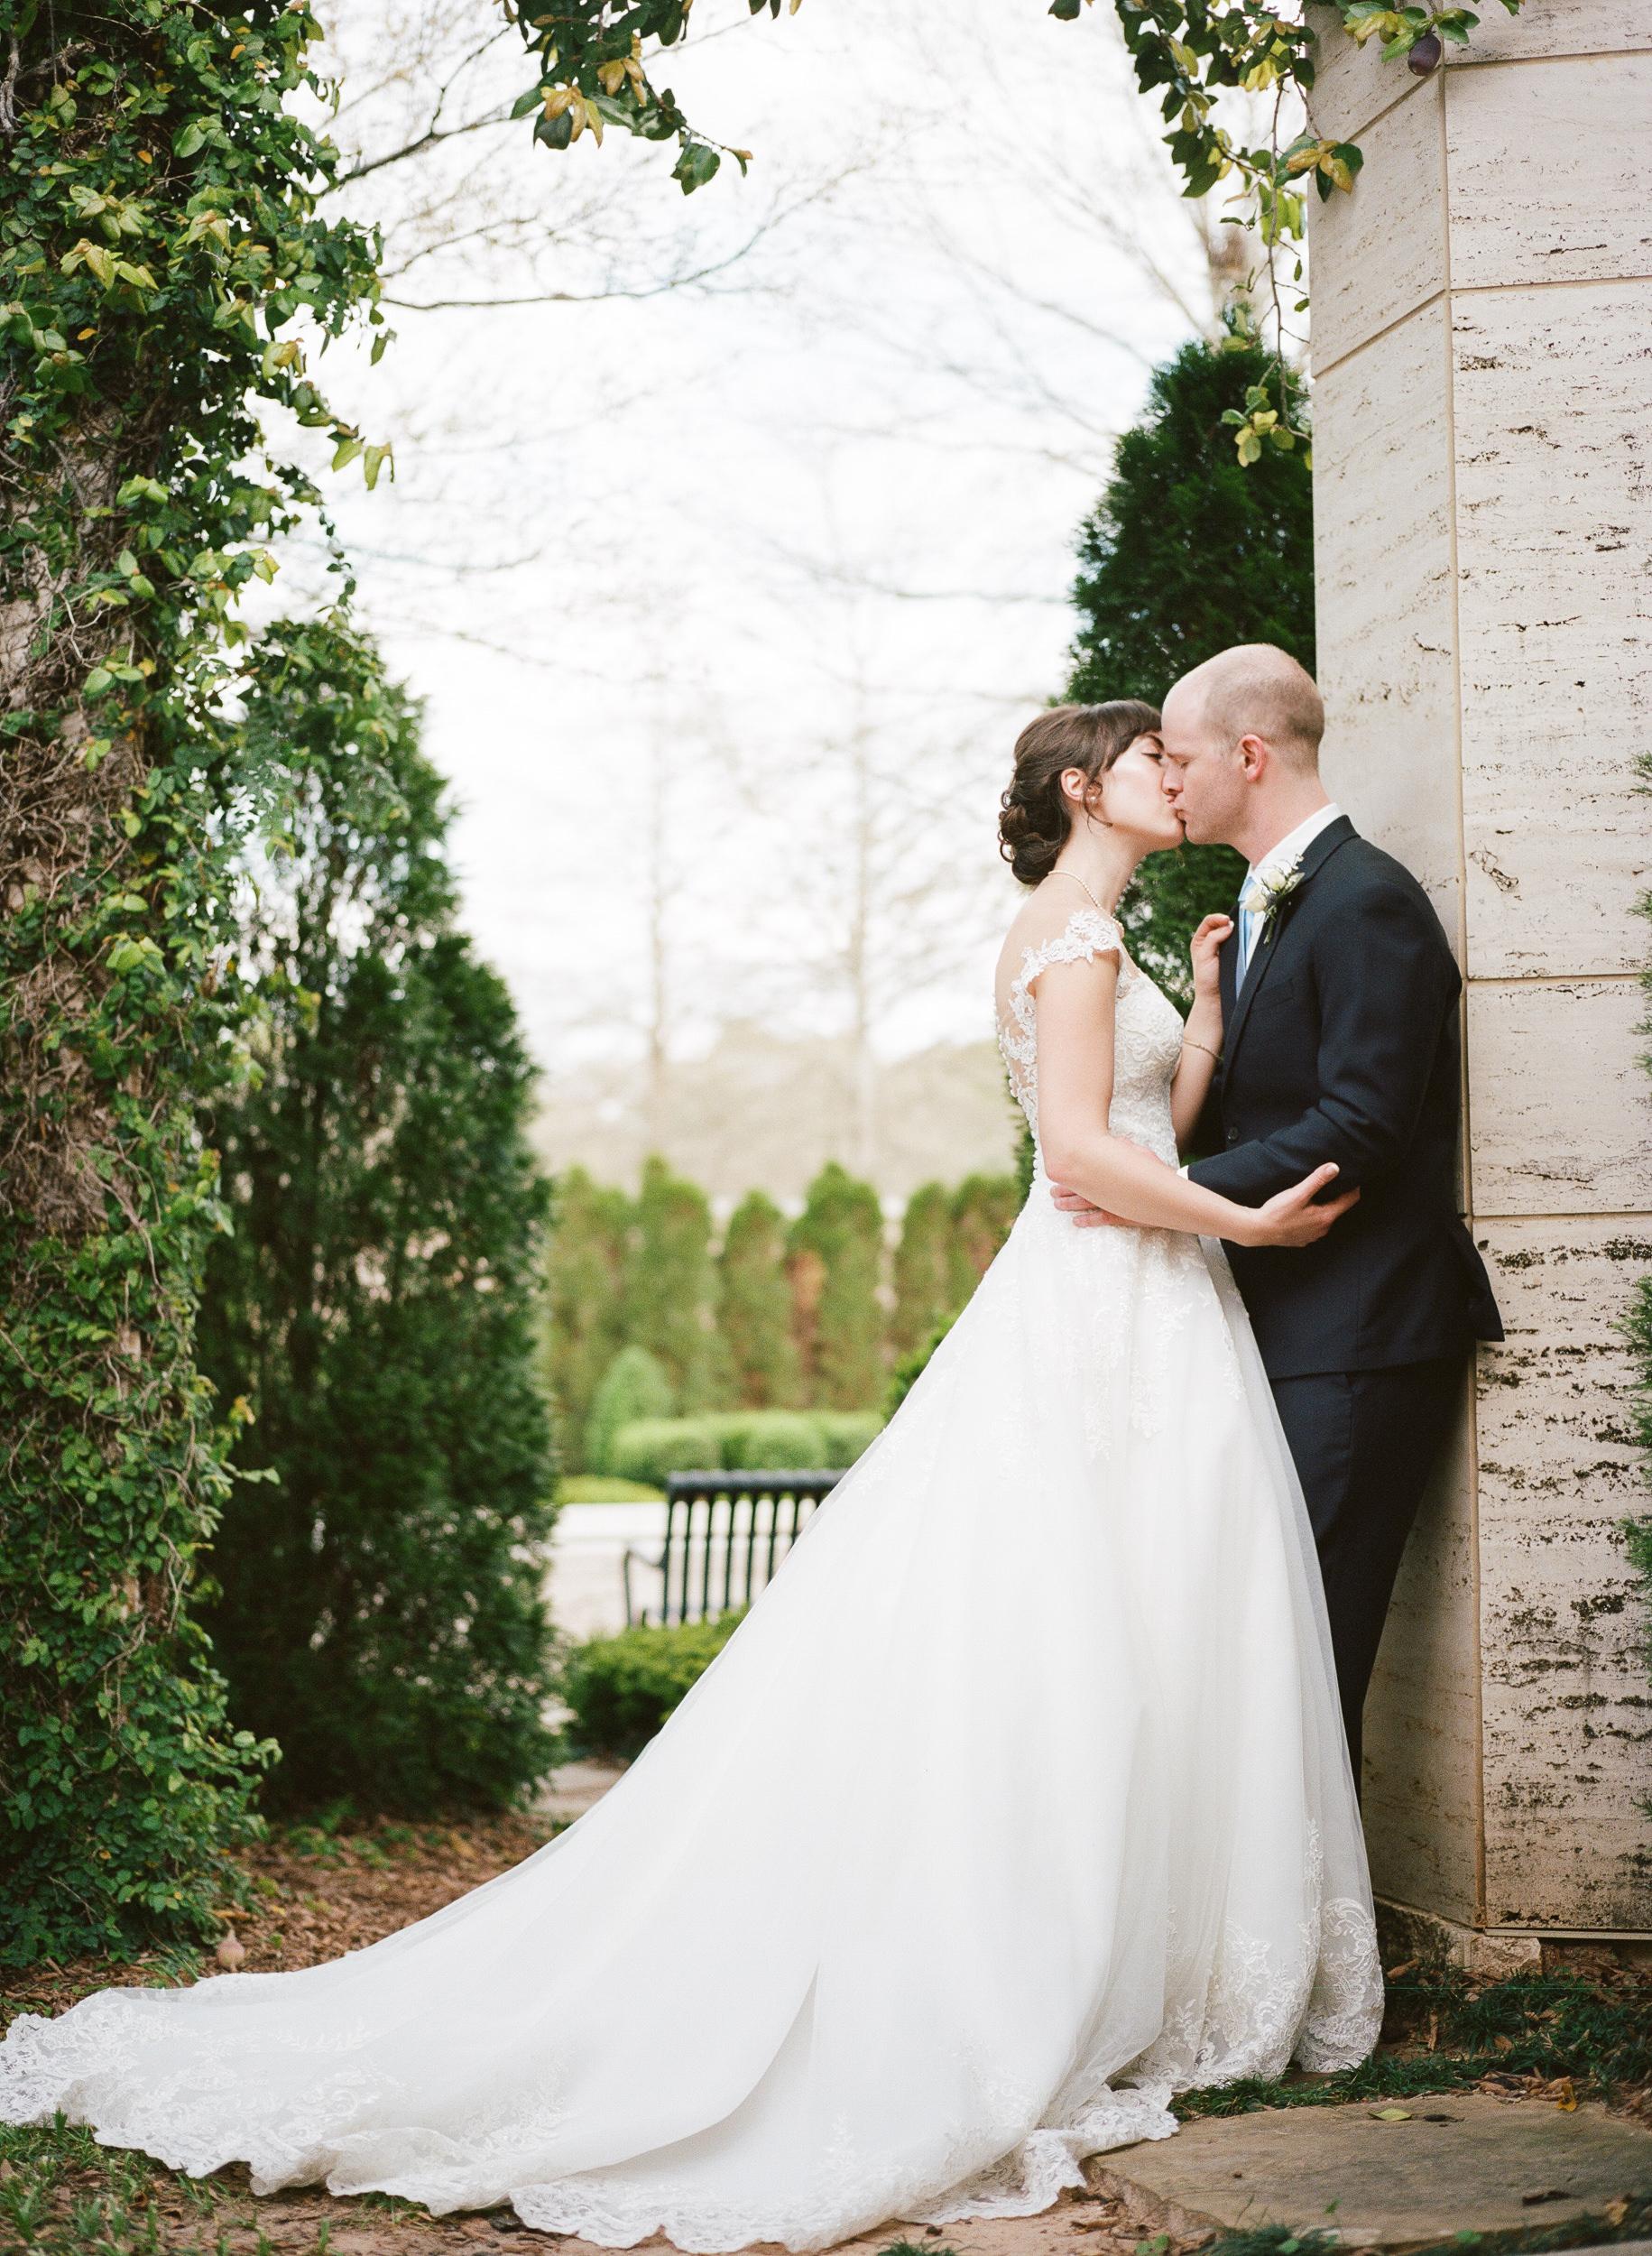 AB_Auburn_Wedding_2019-00057.jpg